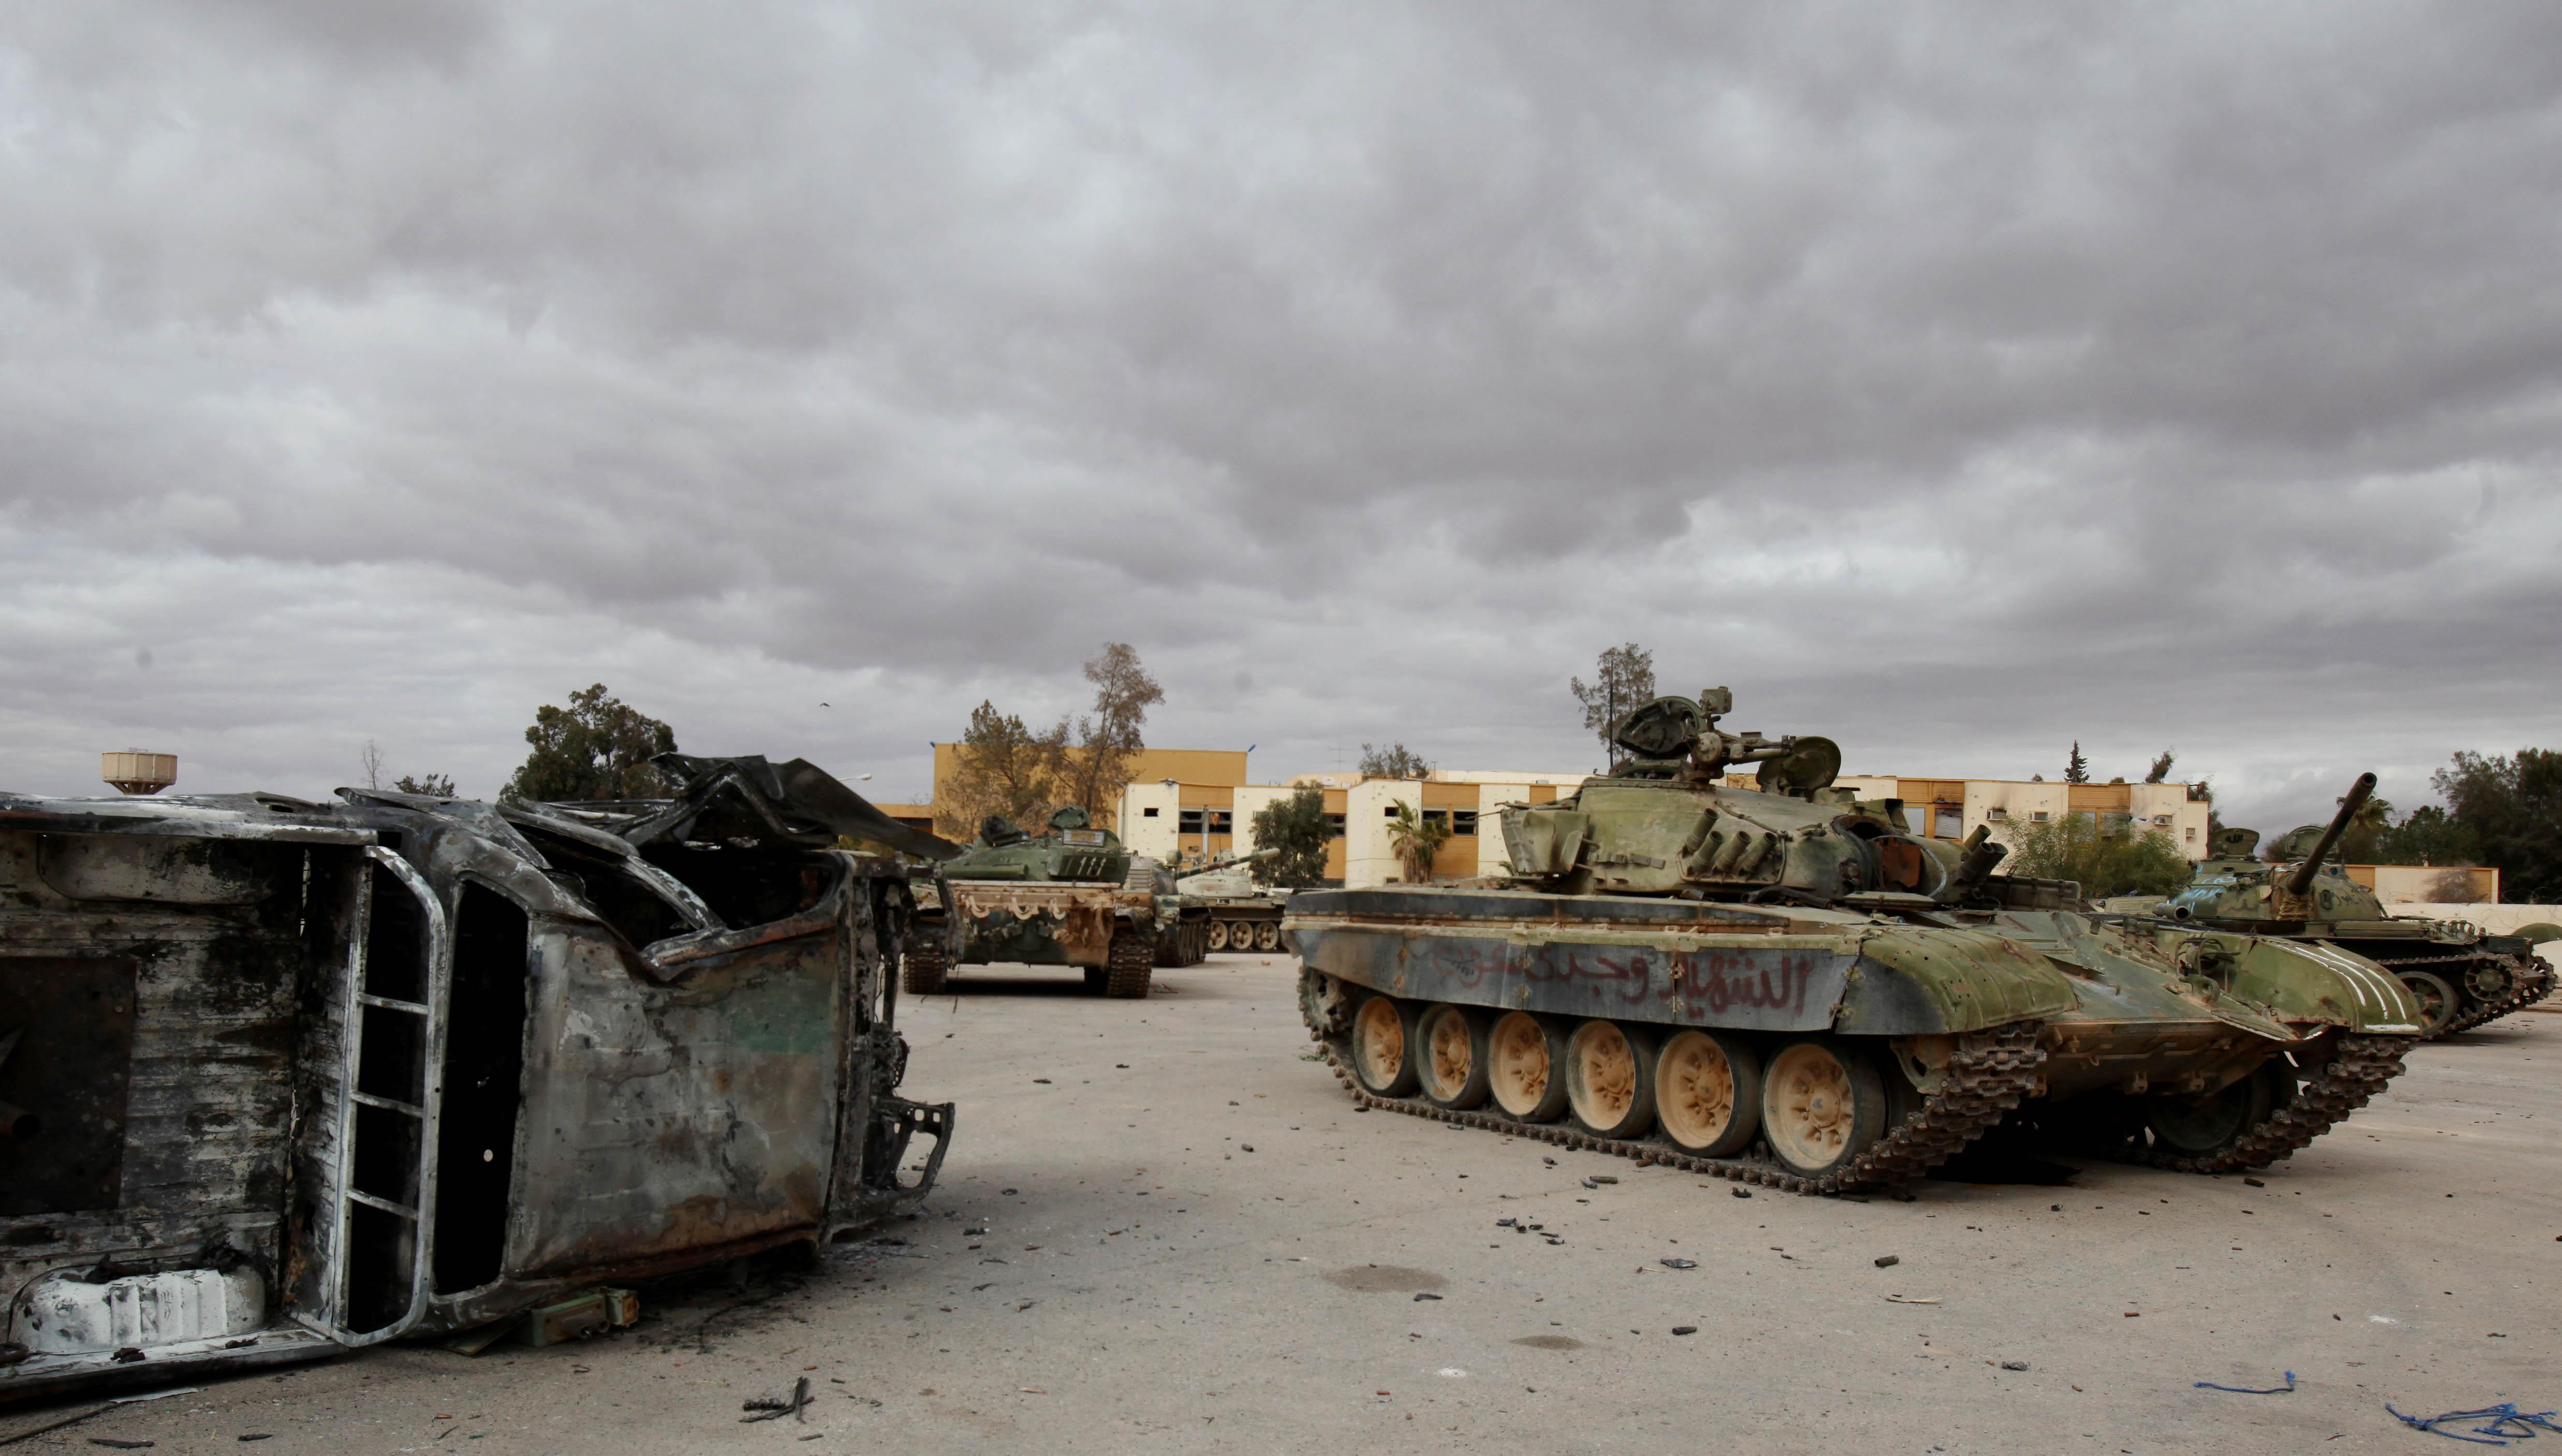 Осада Бени-Валида: город повергнут в хаос